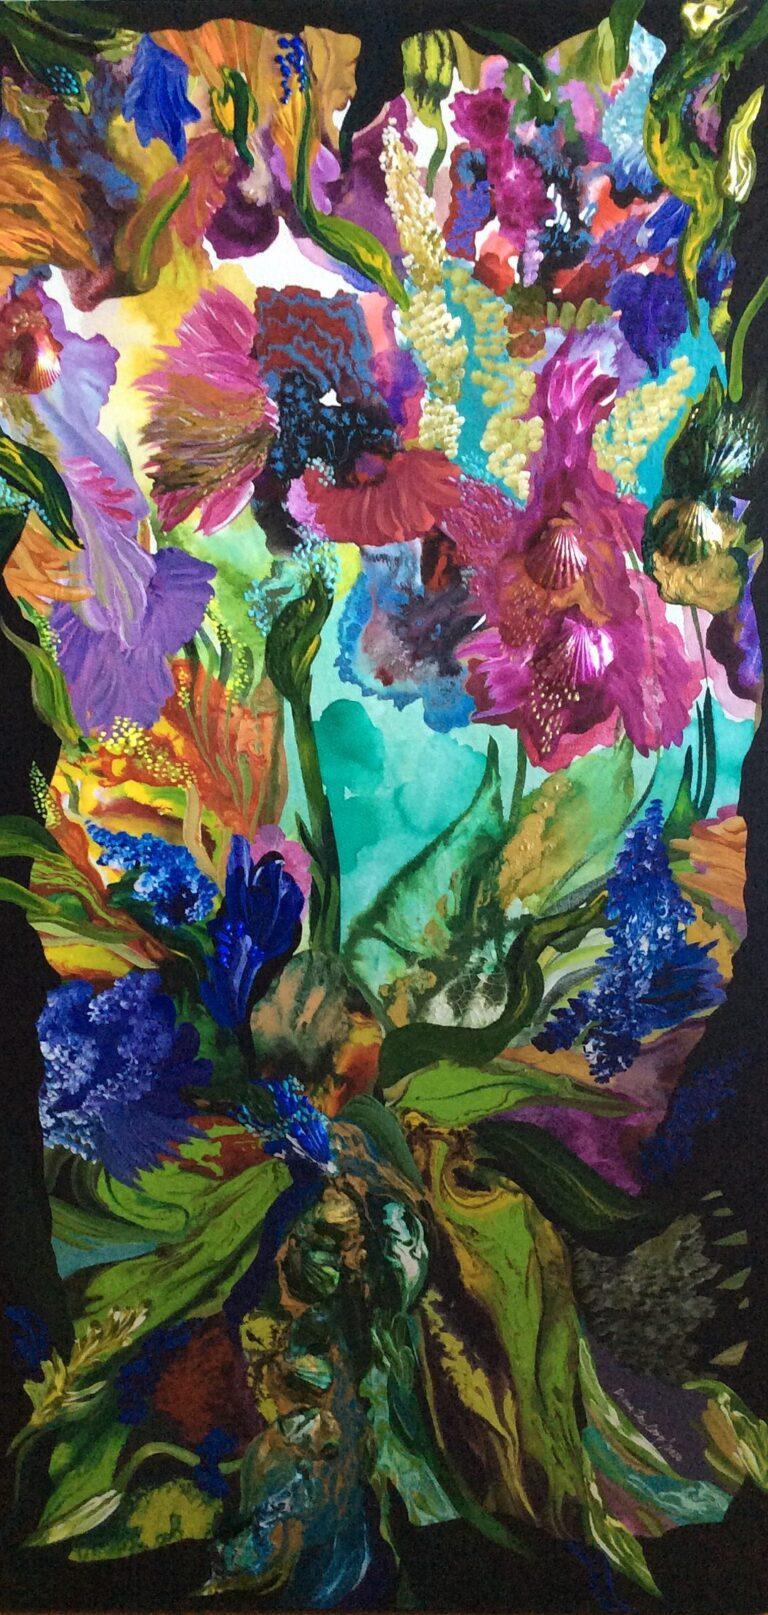 Summer in Bloom 2021 | New work by Diana Zoe Coop artist